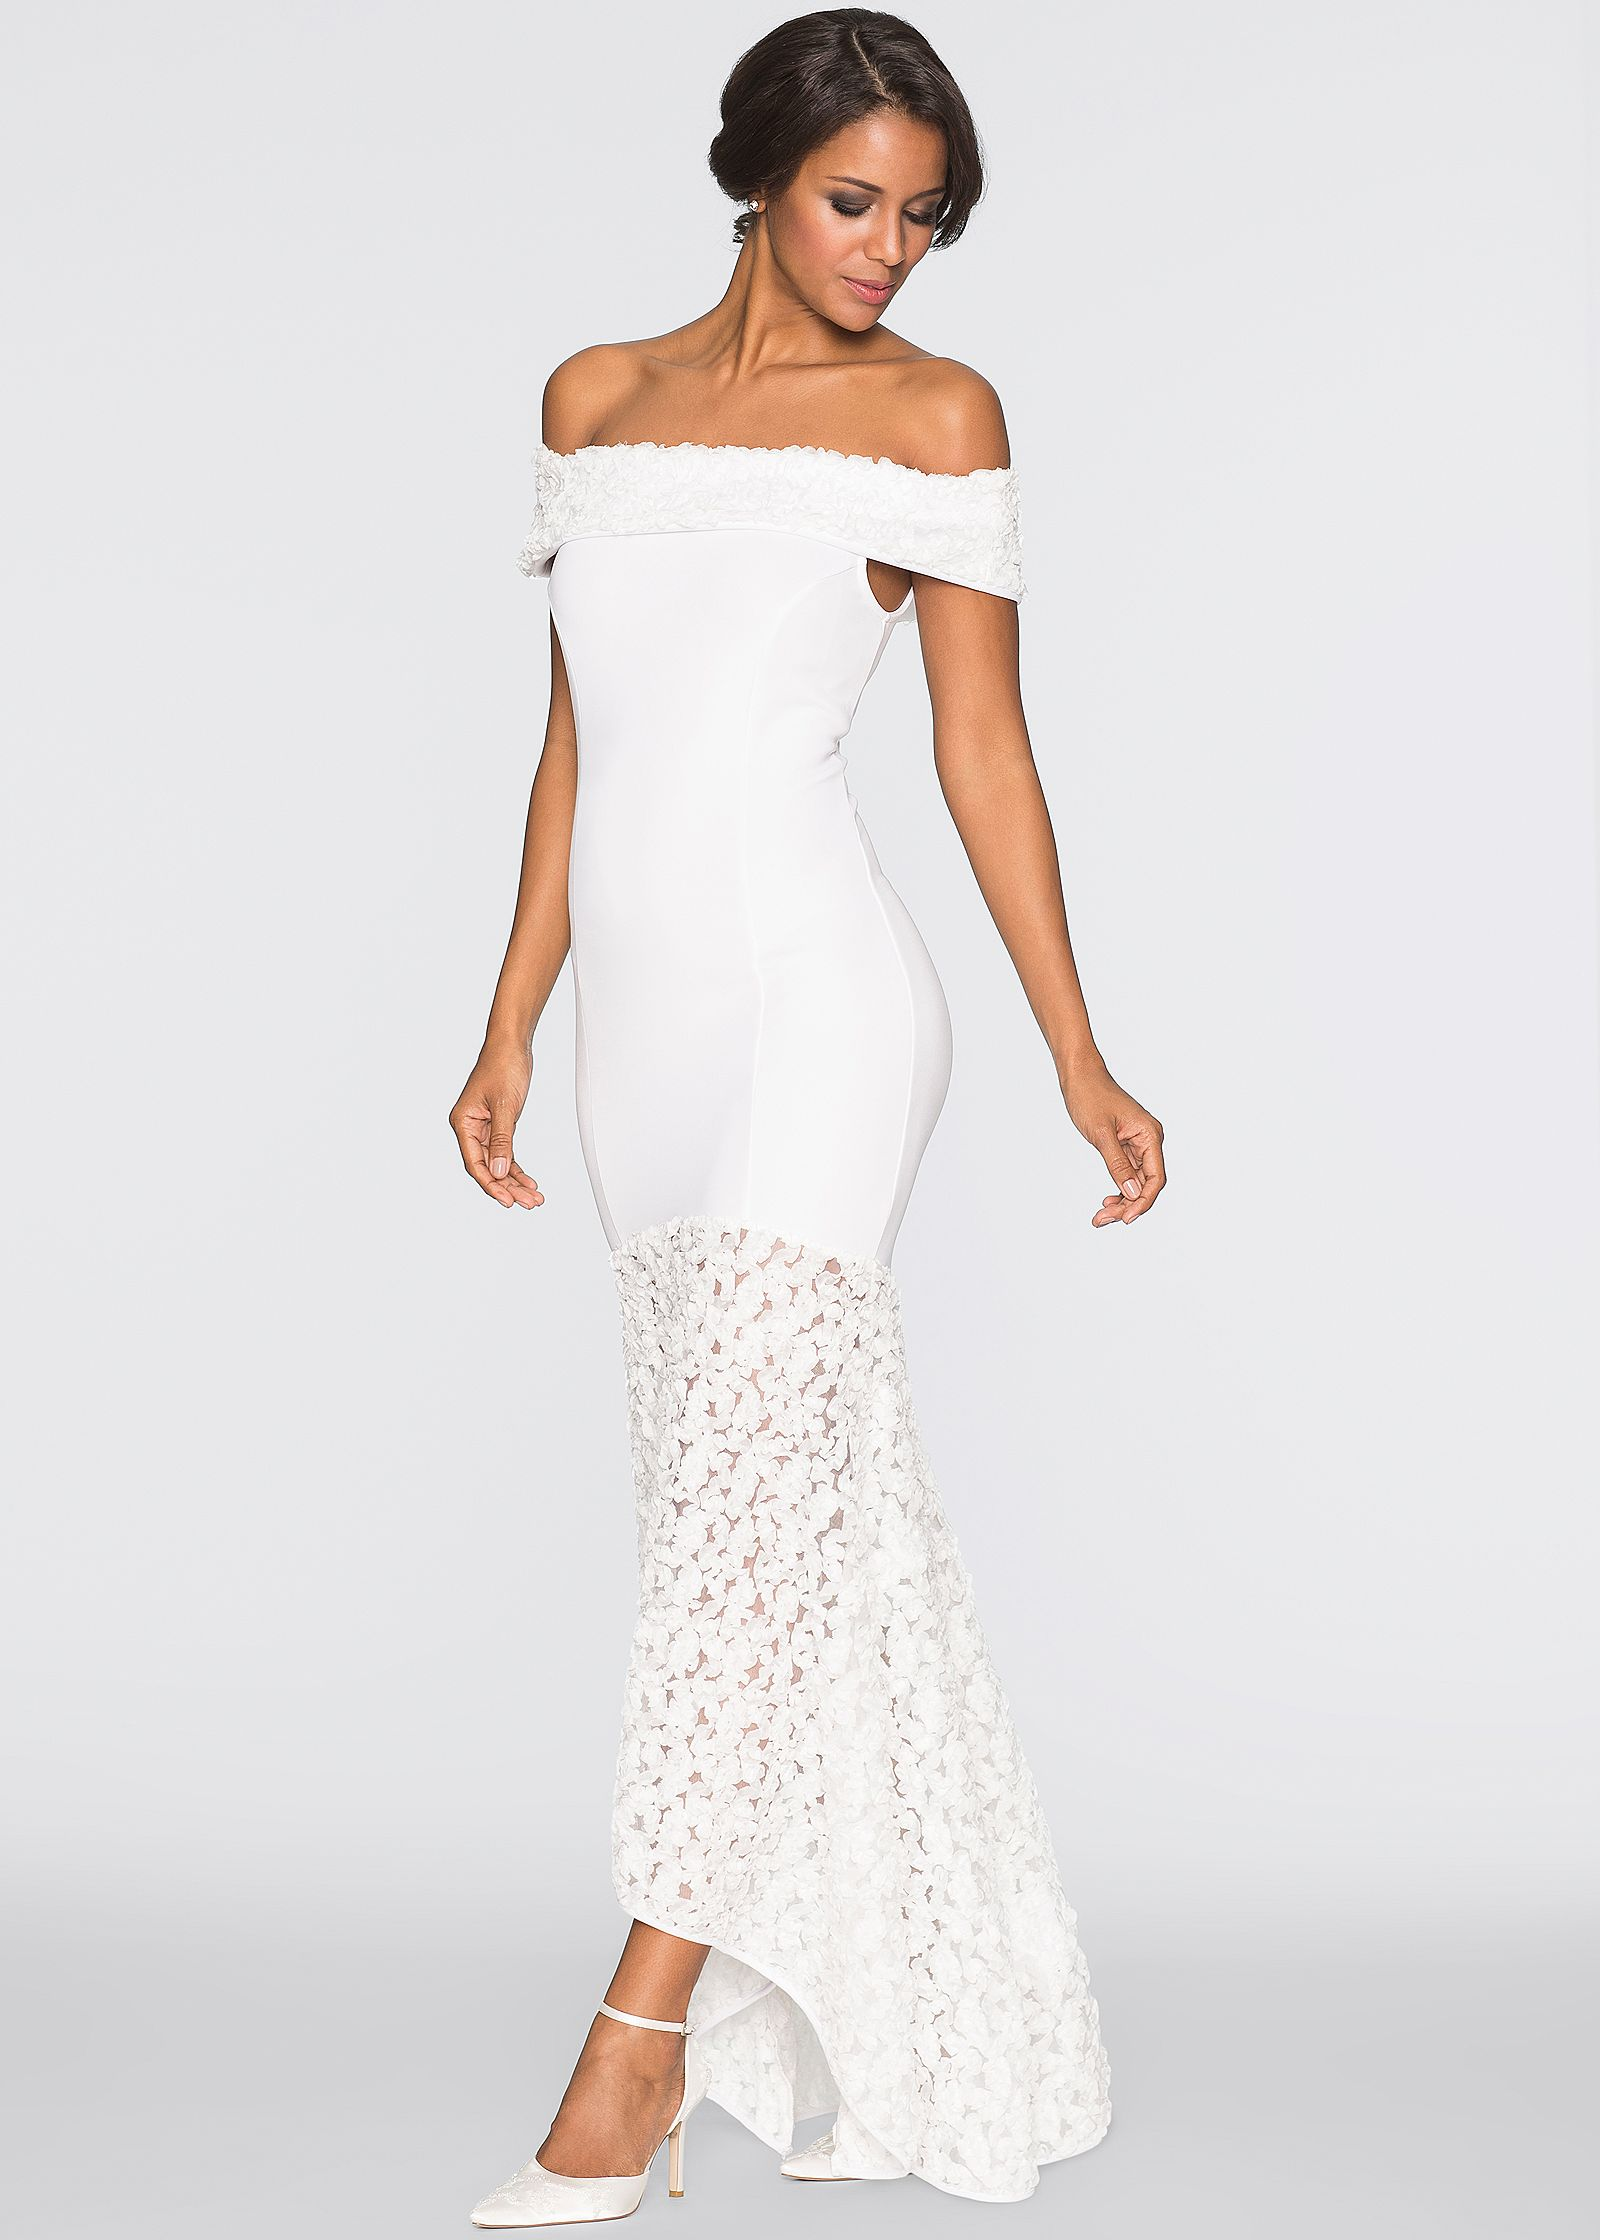 Casual Beach Wedding Dresses Plus Size 80 Inspirational STRAPLESS WEDDING DRESS